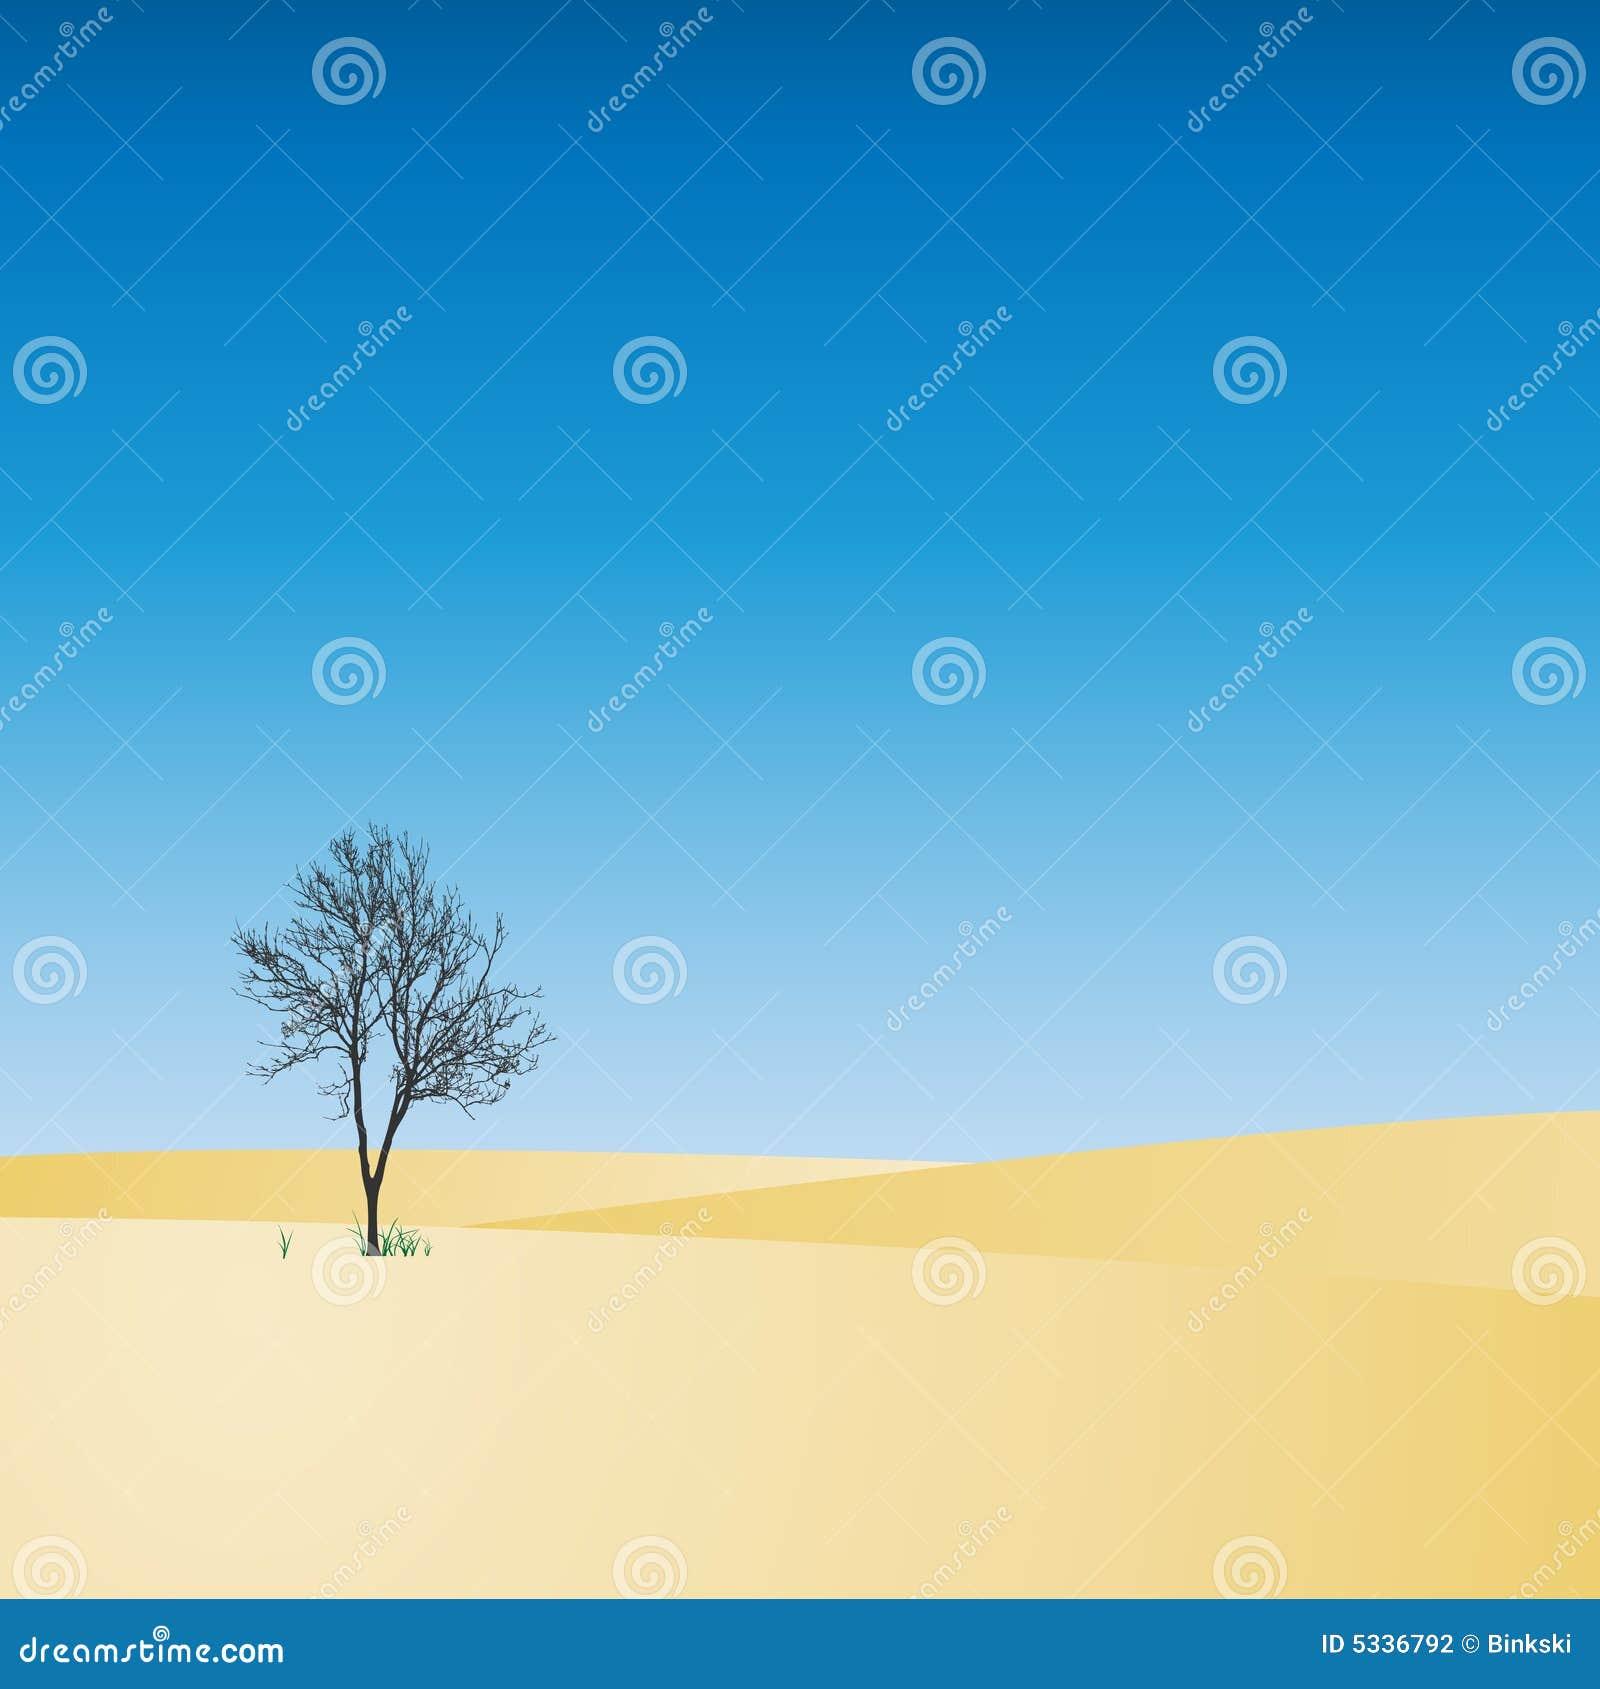 Liggandetree